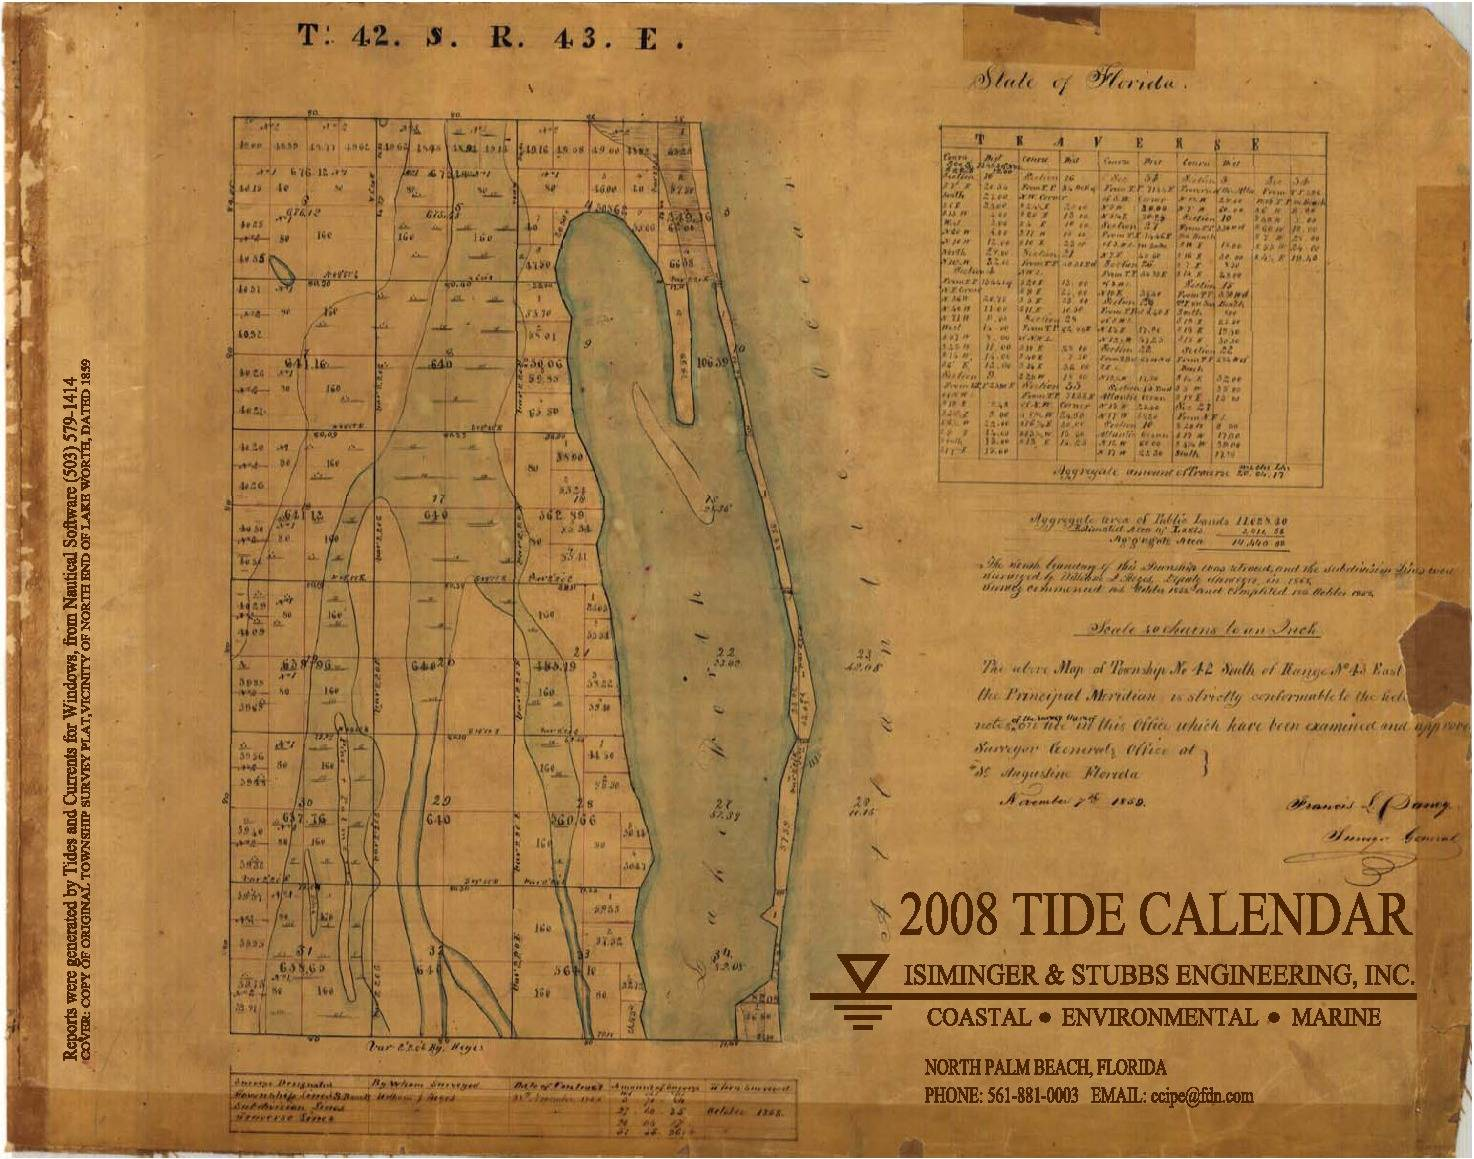 2008 Tide Calendar Cover